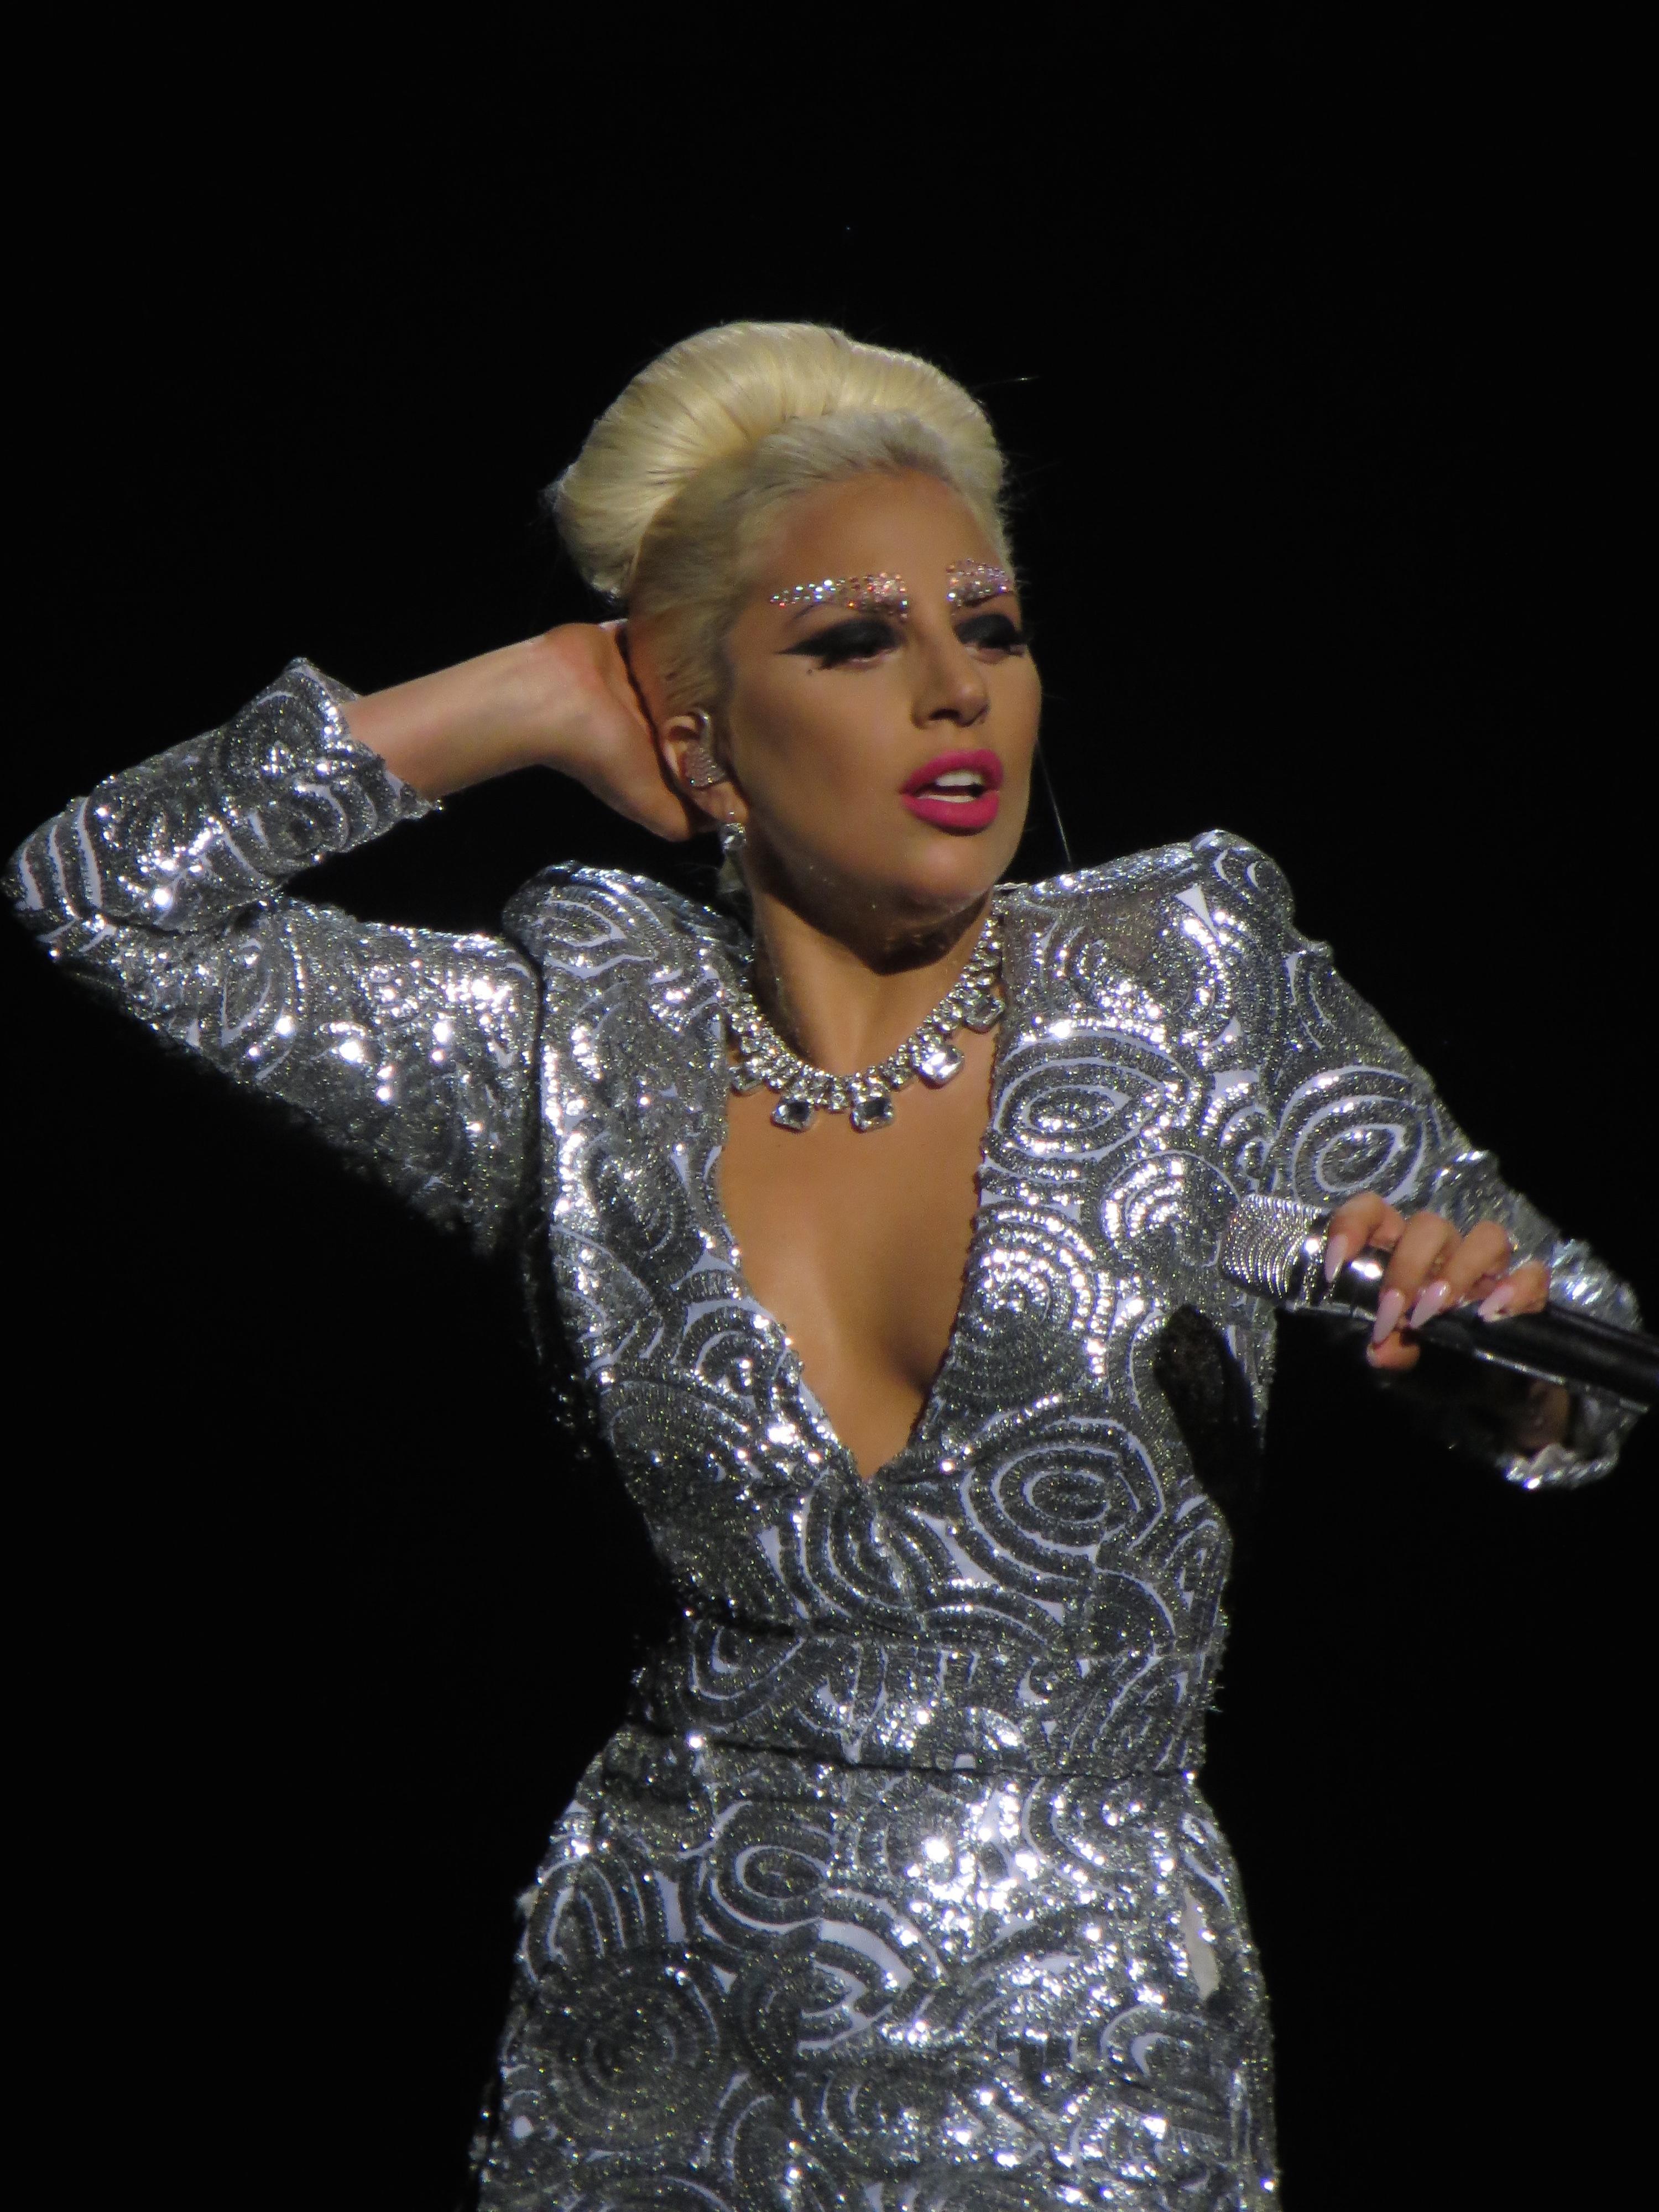 Tony Bennett And Lady Gaga Cheek To Cheek Tour